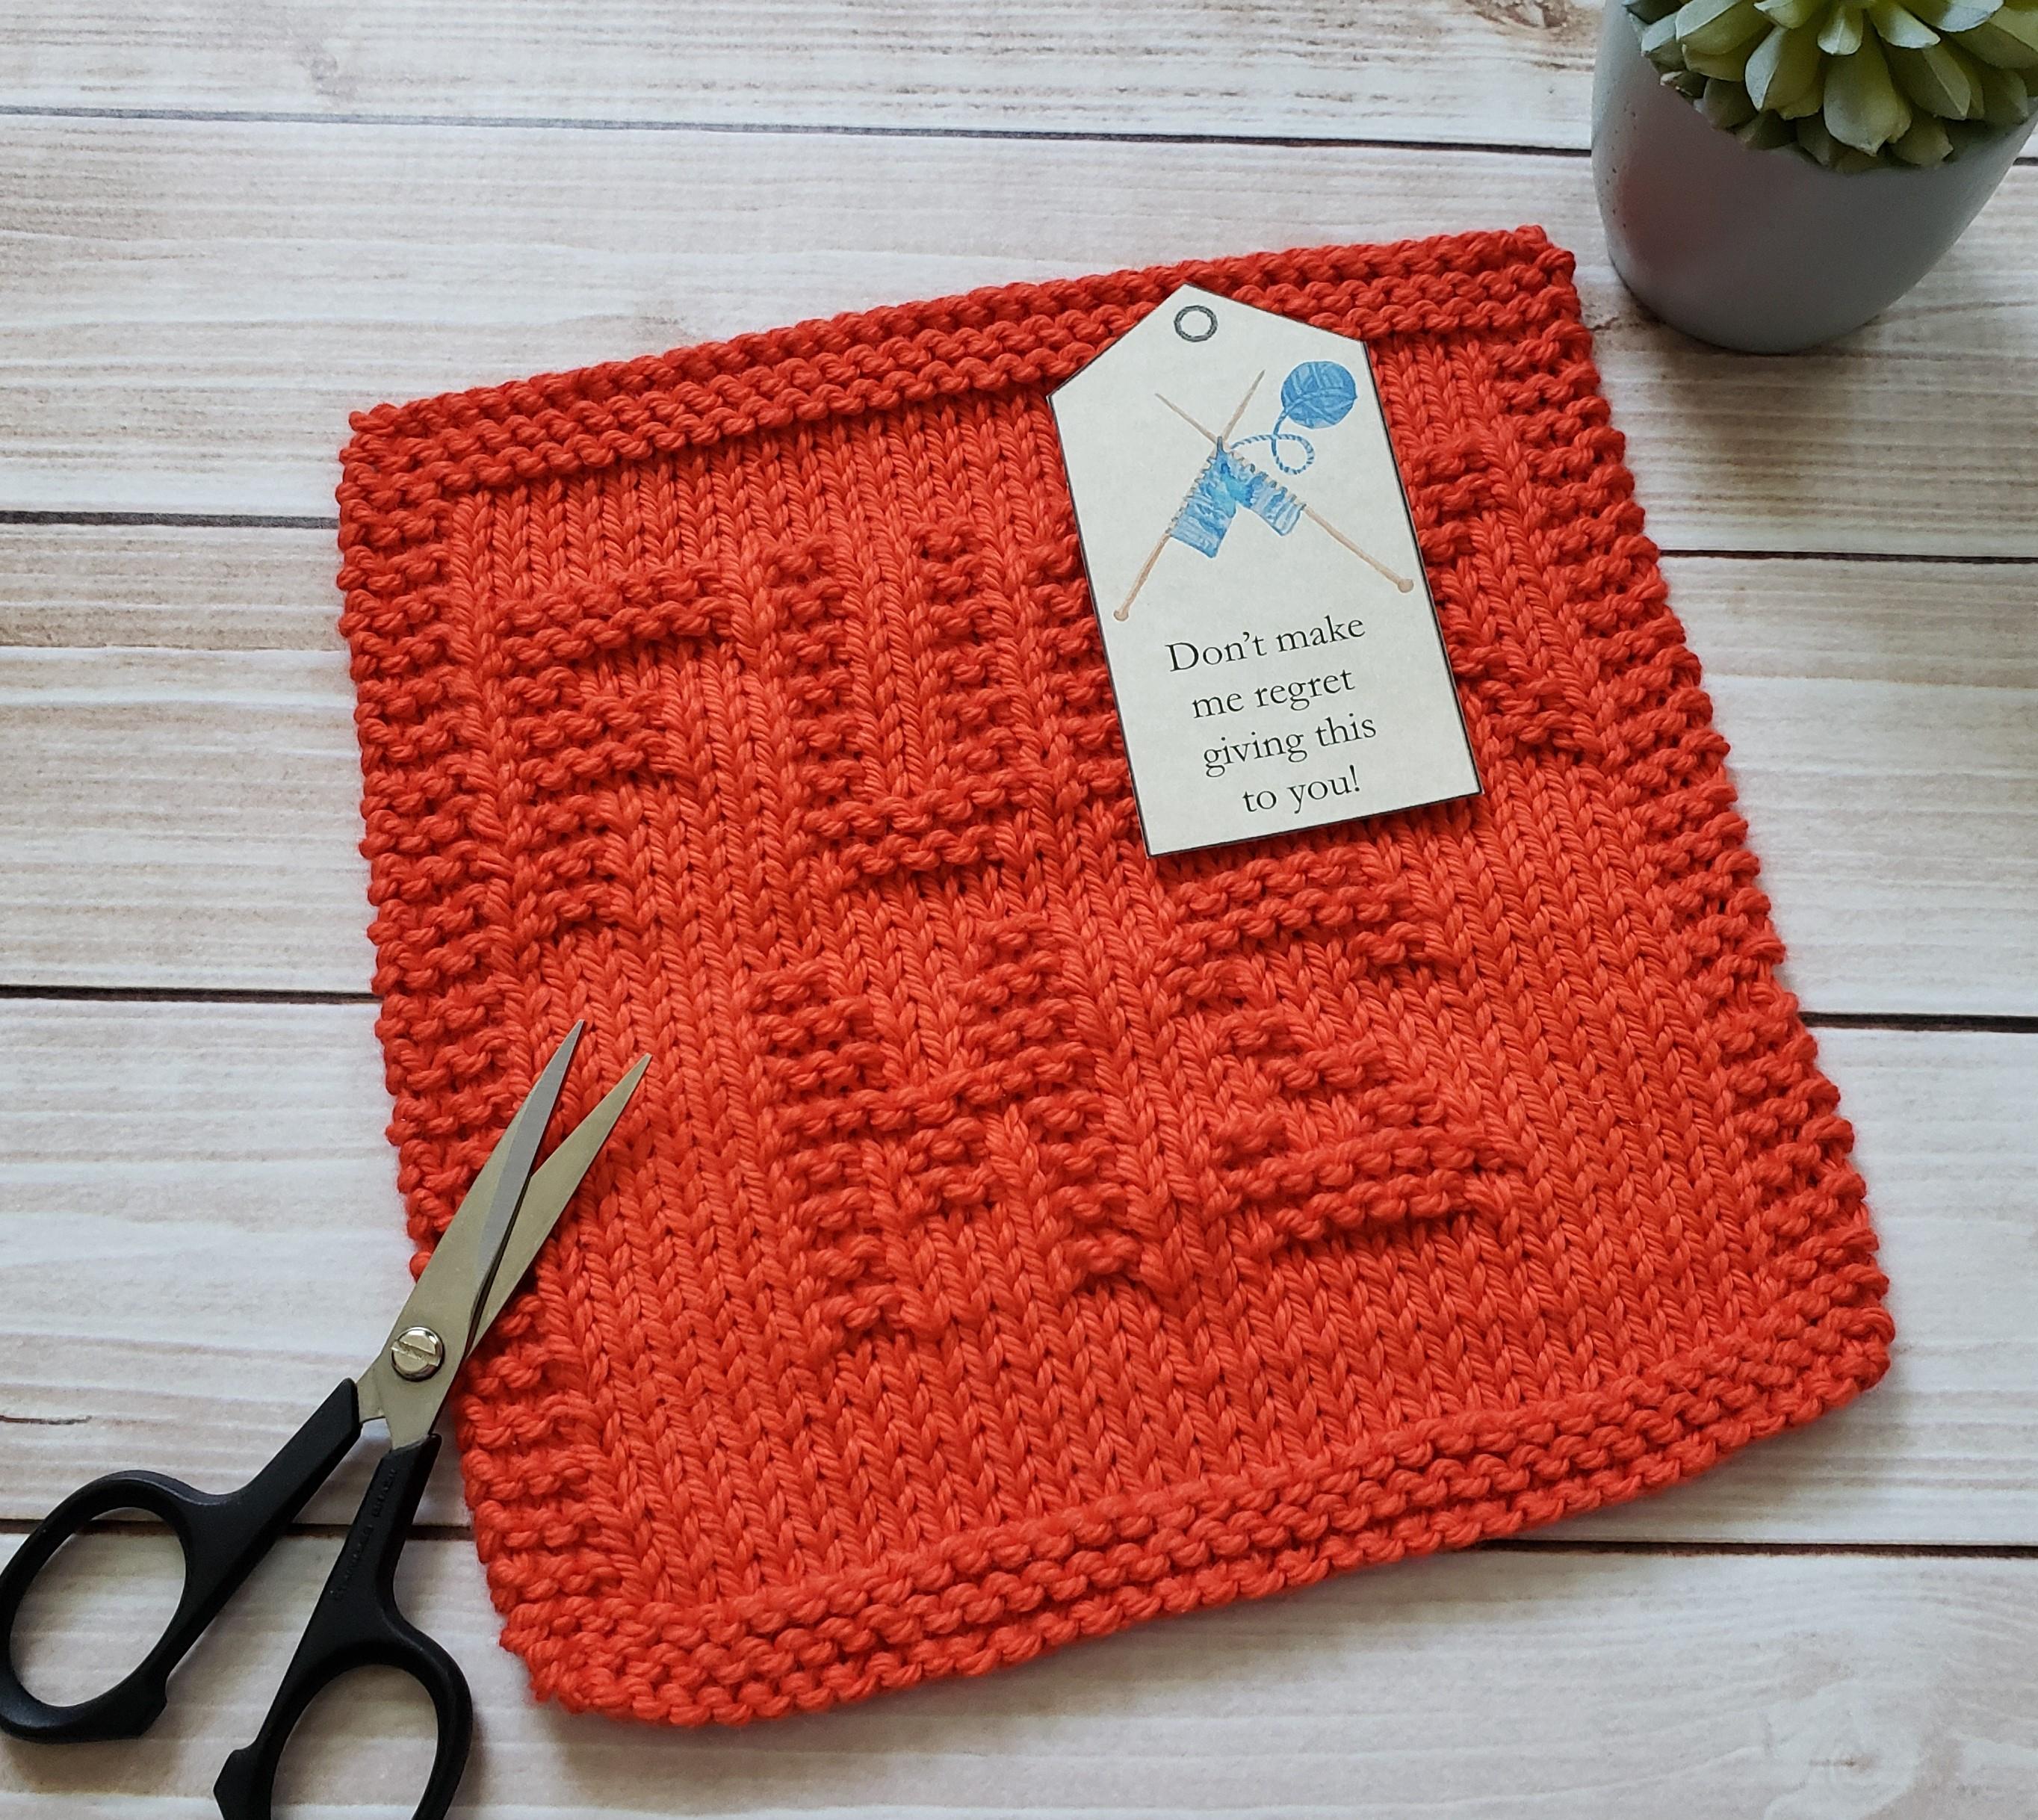 Knit Washcloth Patterns Instant Digital Download F Ms Dishcloth Knit Pdf Pattern Beginner Easy Knitting Project Fuck Ms Washcloth